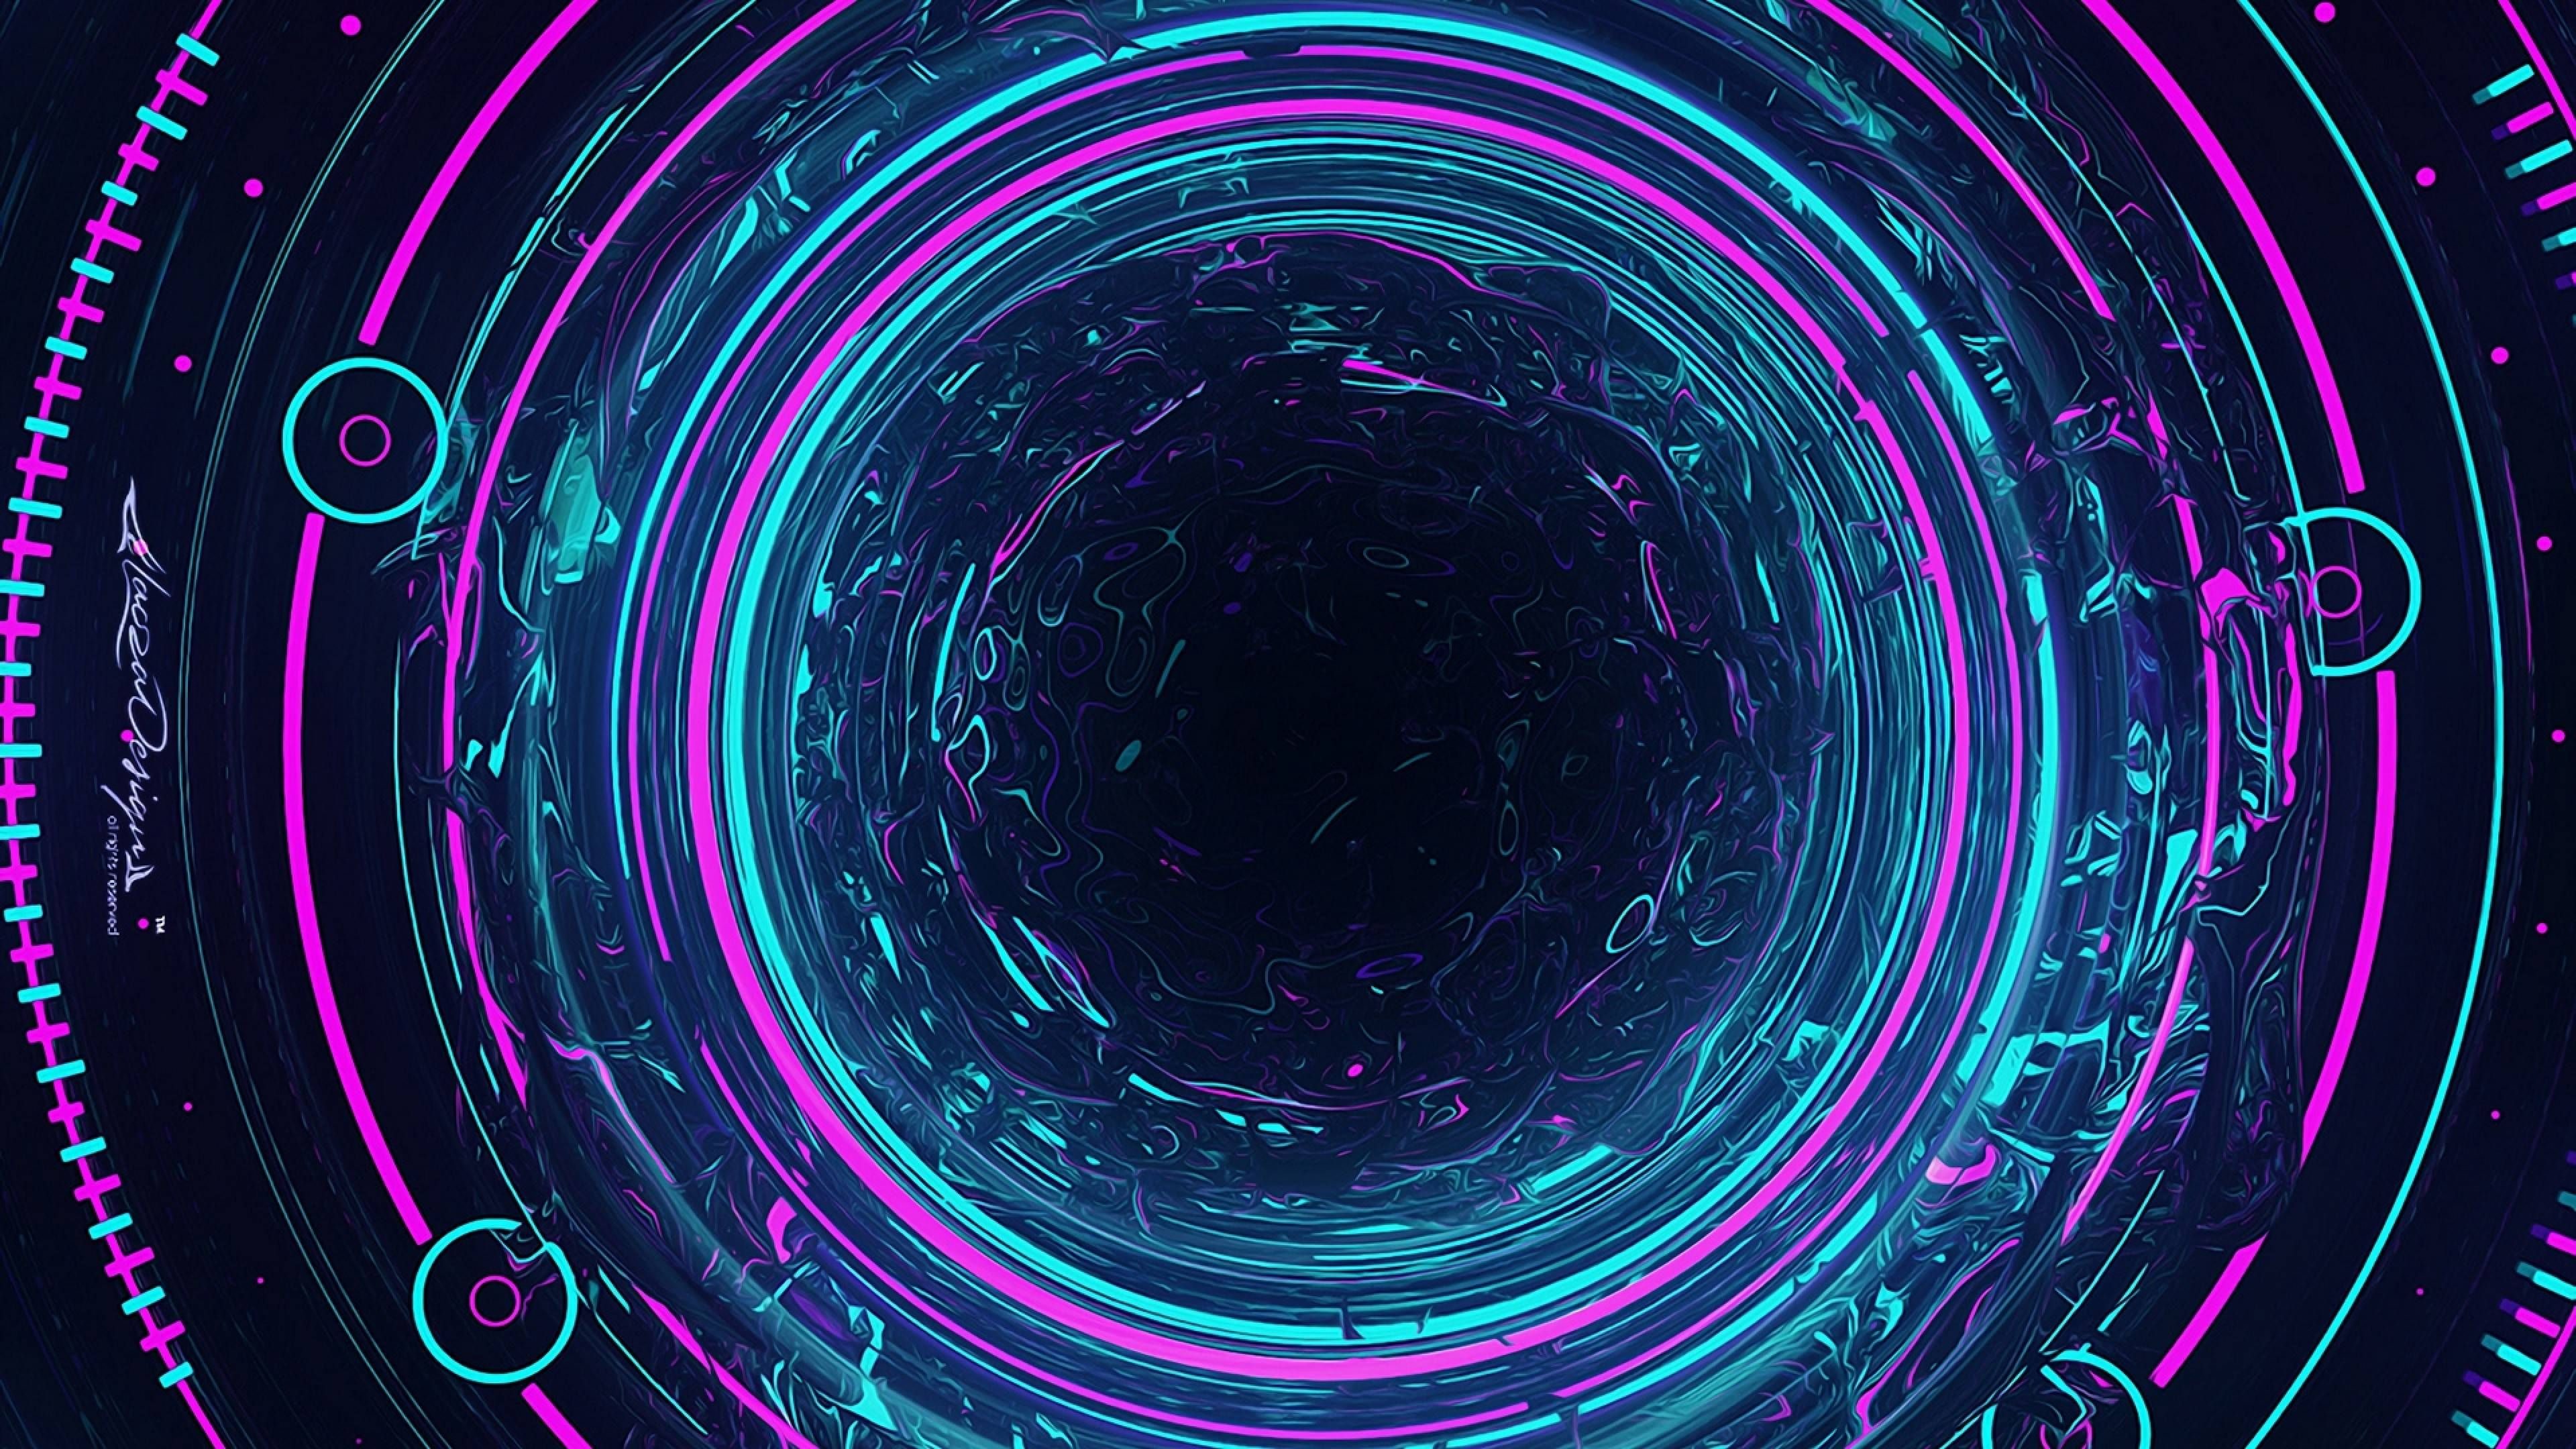 Circles 4k Wallpaper 3840 X 2160 In 2020 Purple Wallpaper Black And Blue Wallpaper Ultra Hd 4k Wallpaper